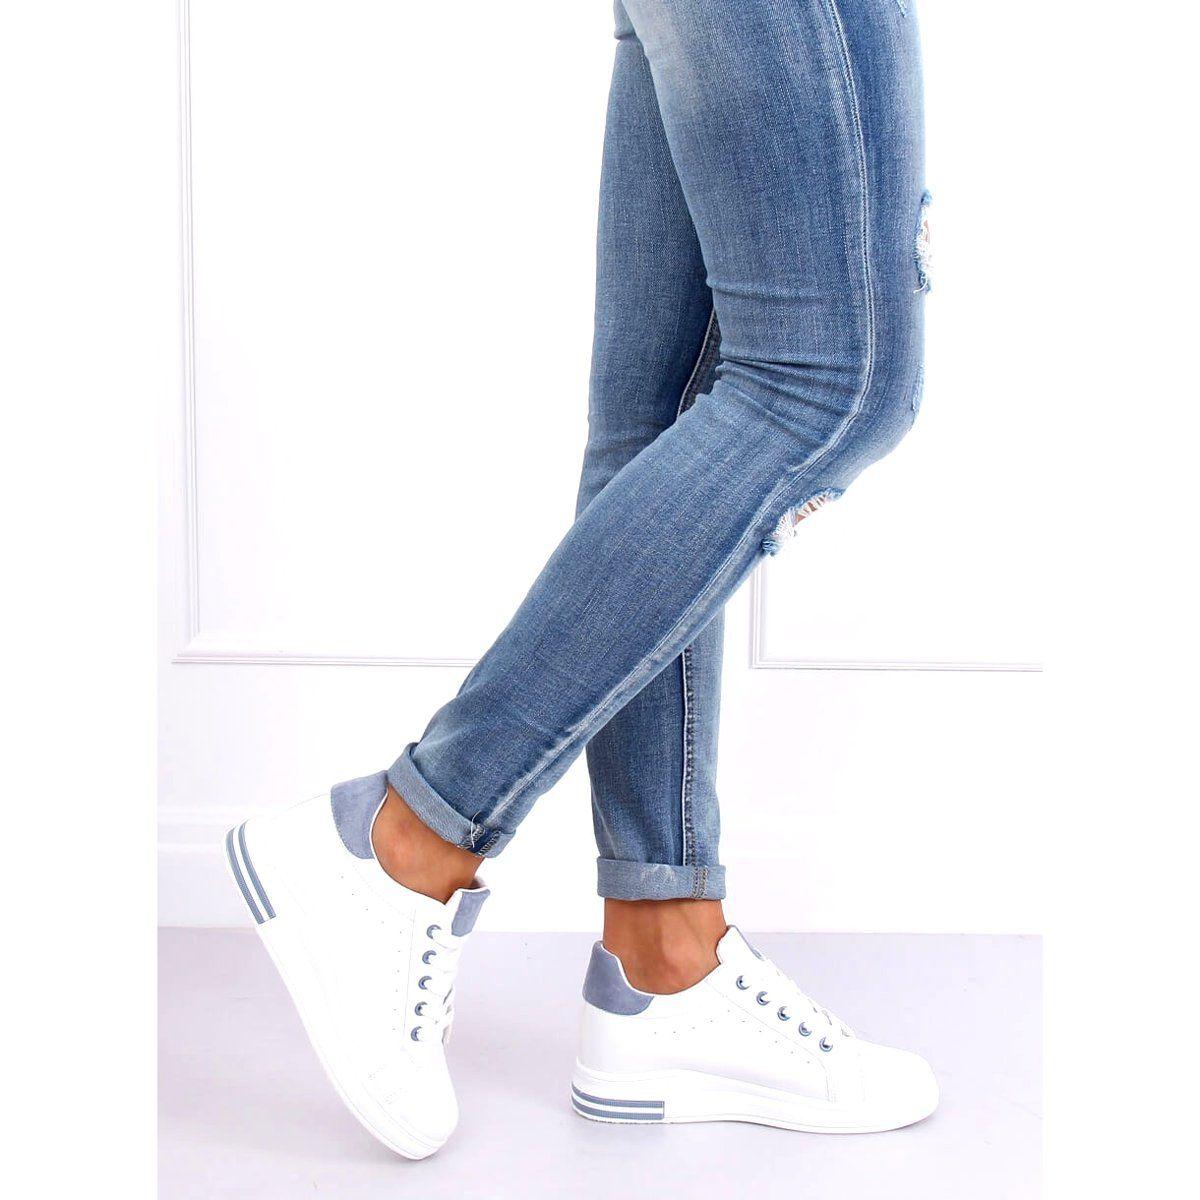 Trampki Damskie Biale L8035 Blue In 2020 Fashion Skinny Jeans Skinny